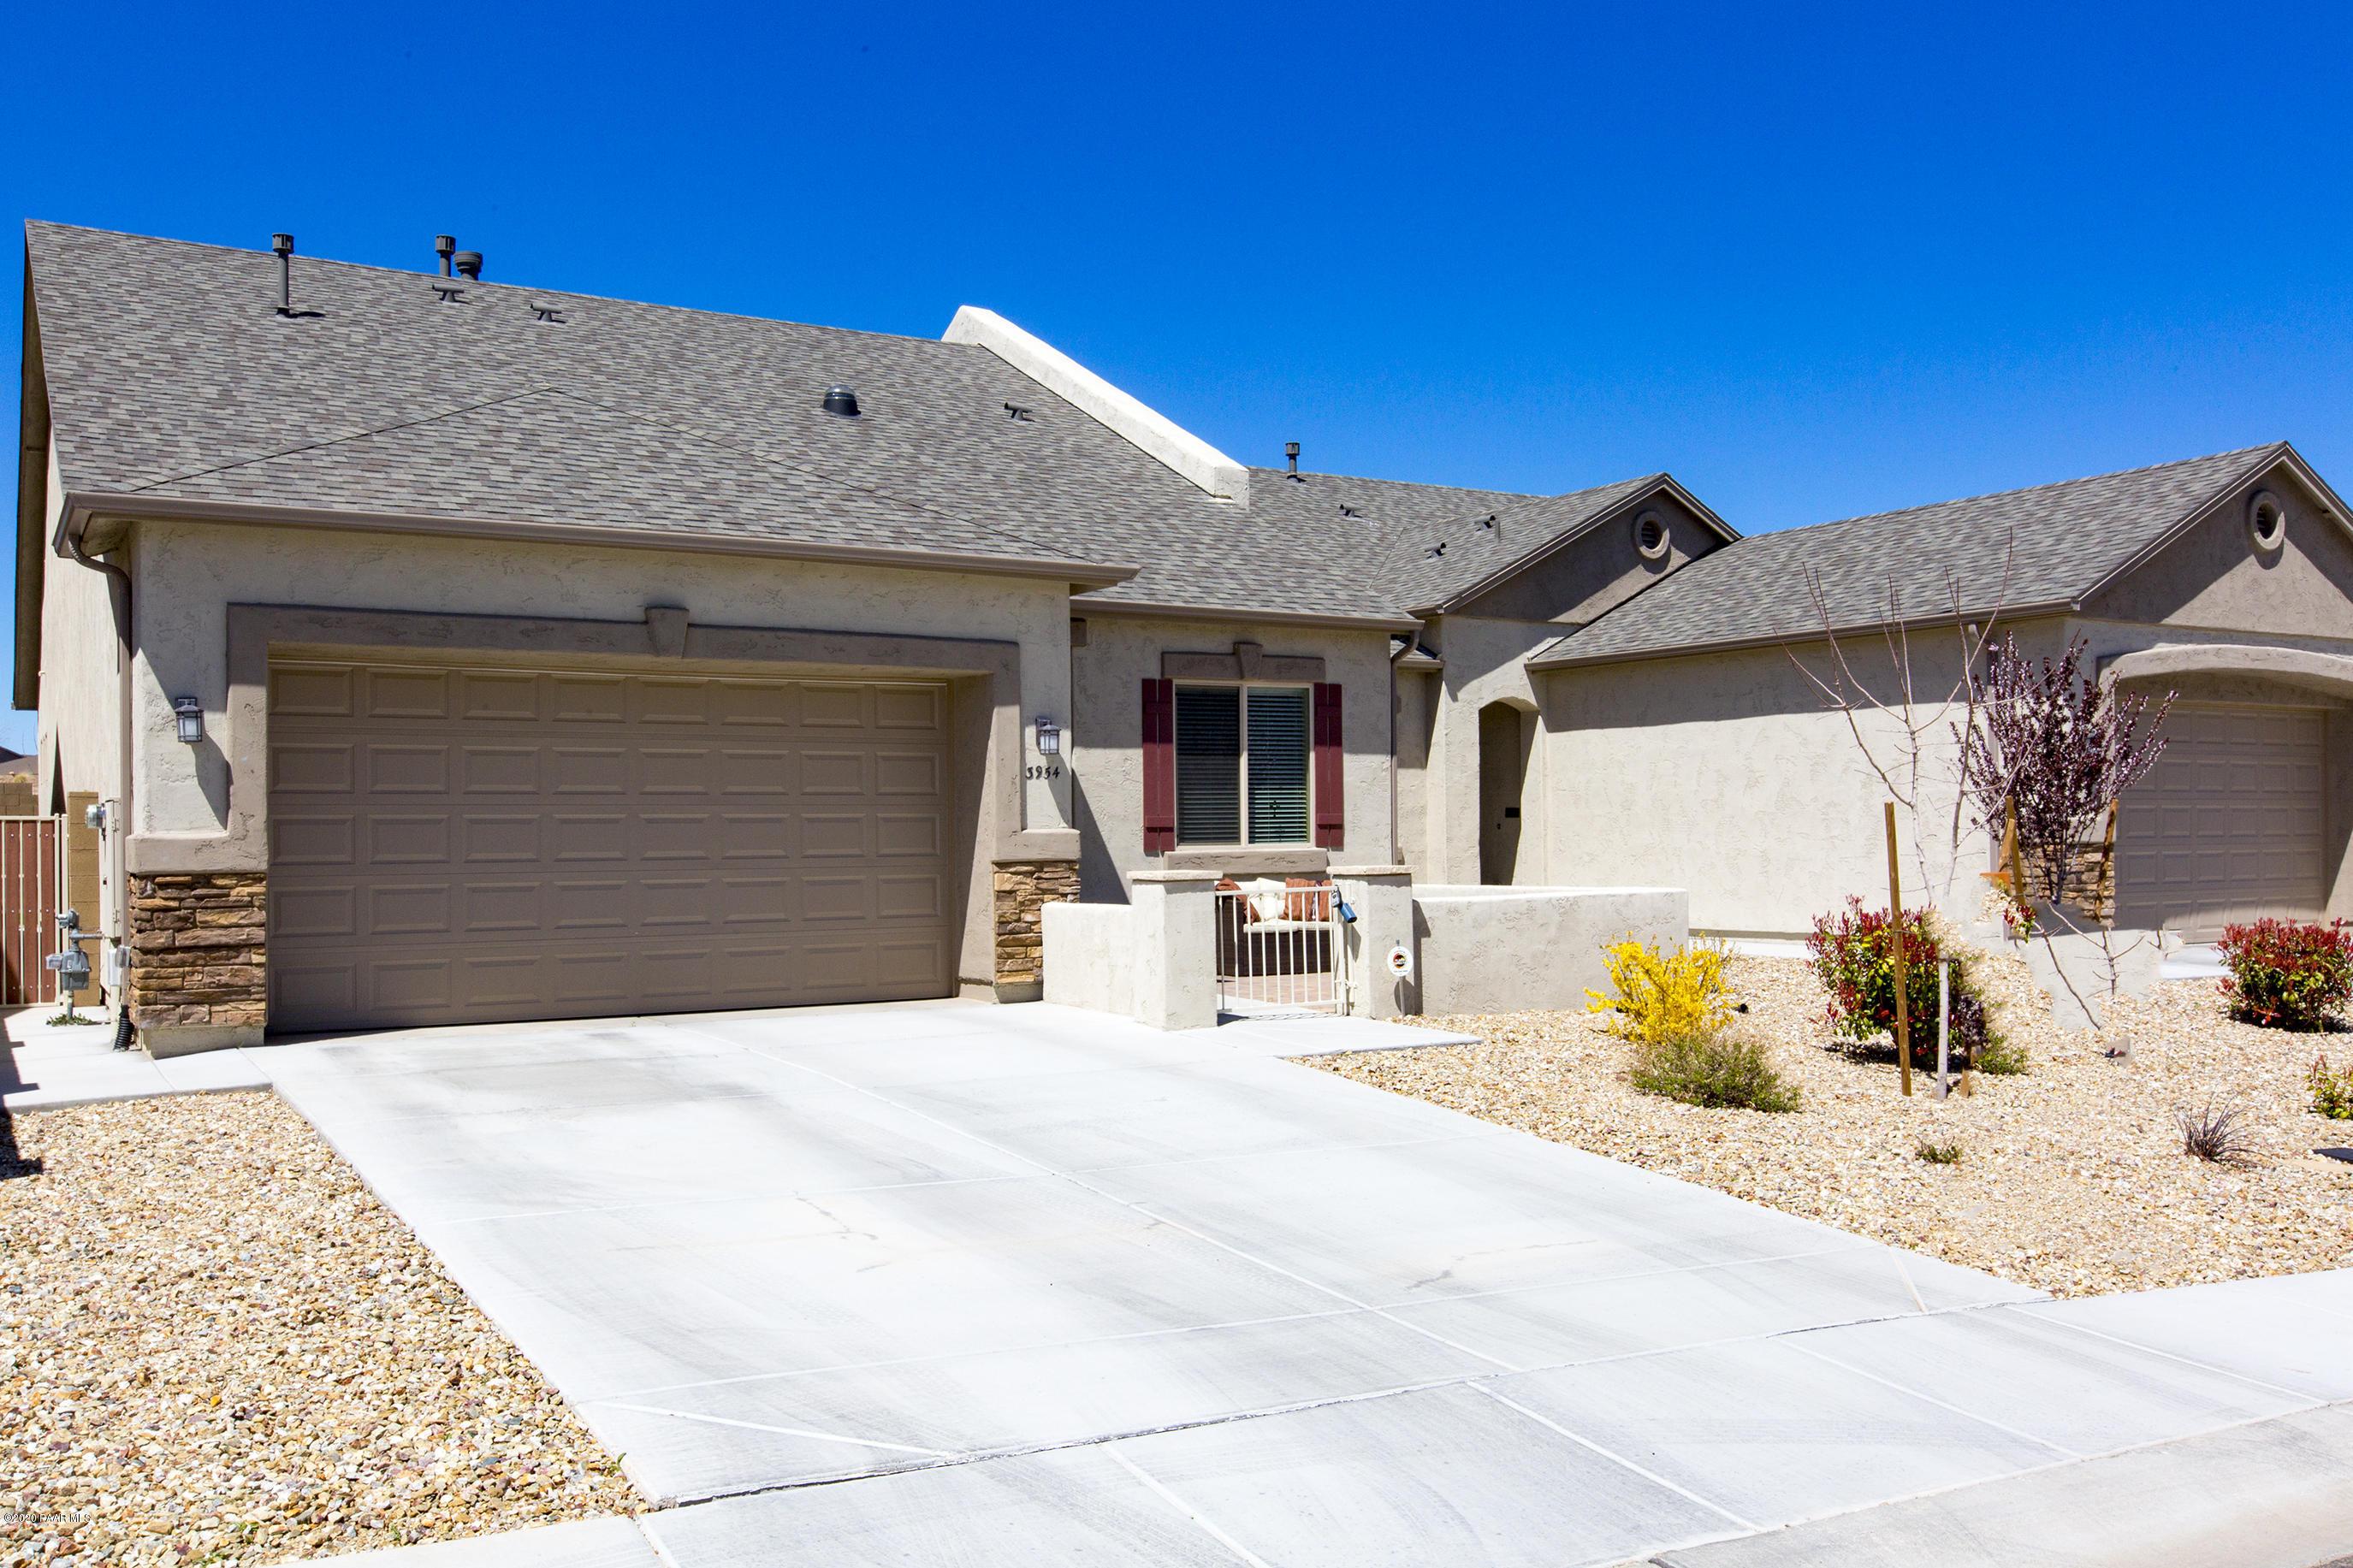 3954 N Marden Lane, one of homes for sale in Prescott Valley